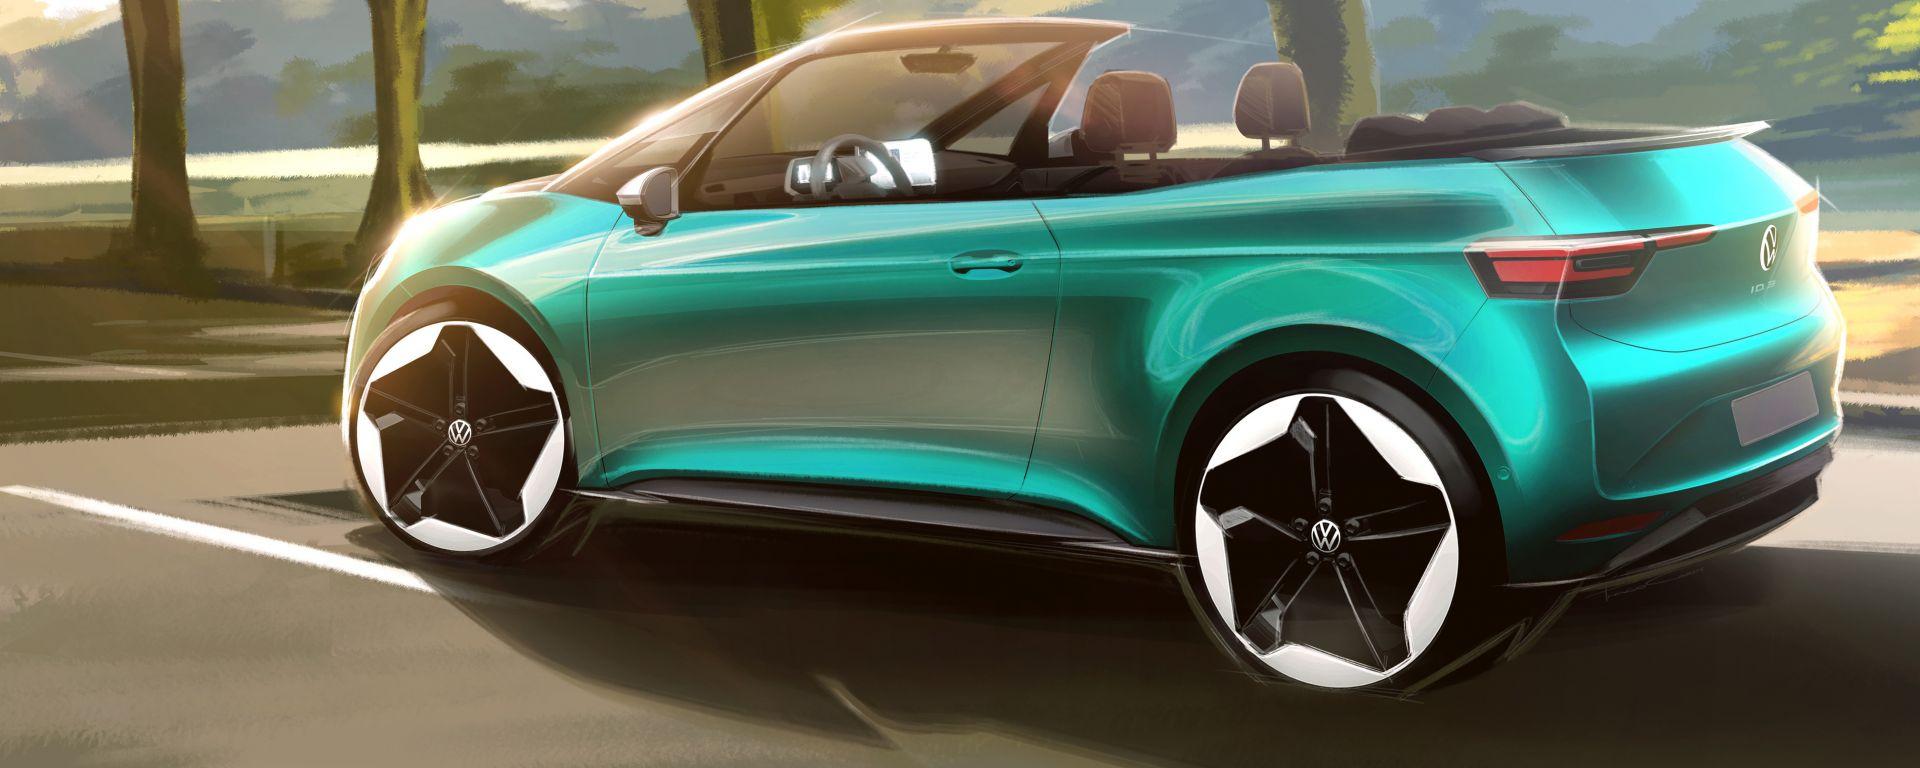 Volkswagen ID.3 cabriolet, primi teaser ufficiali